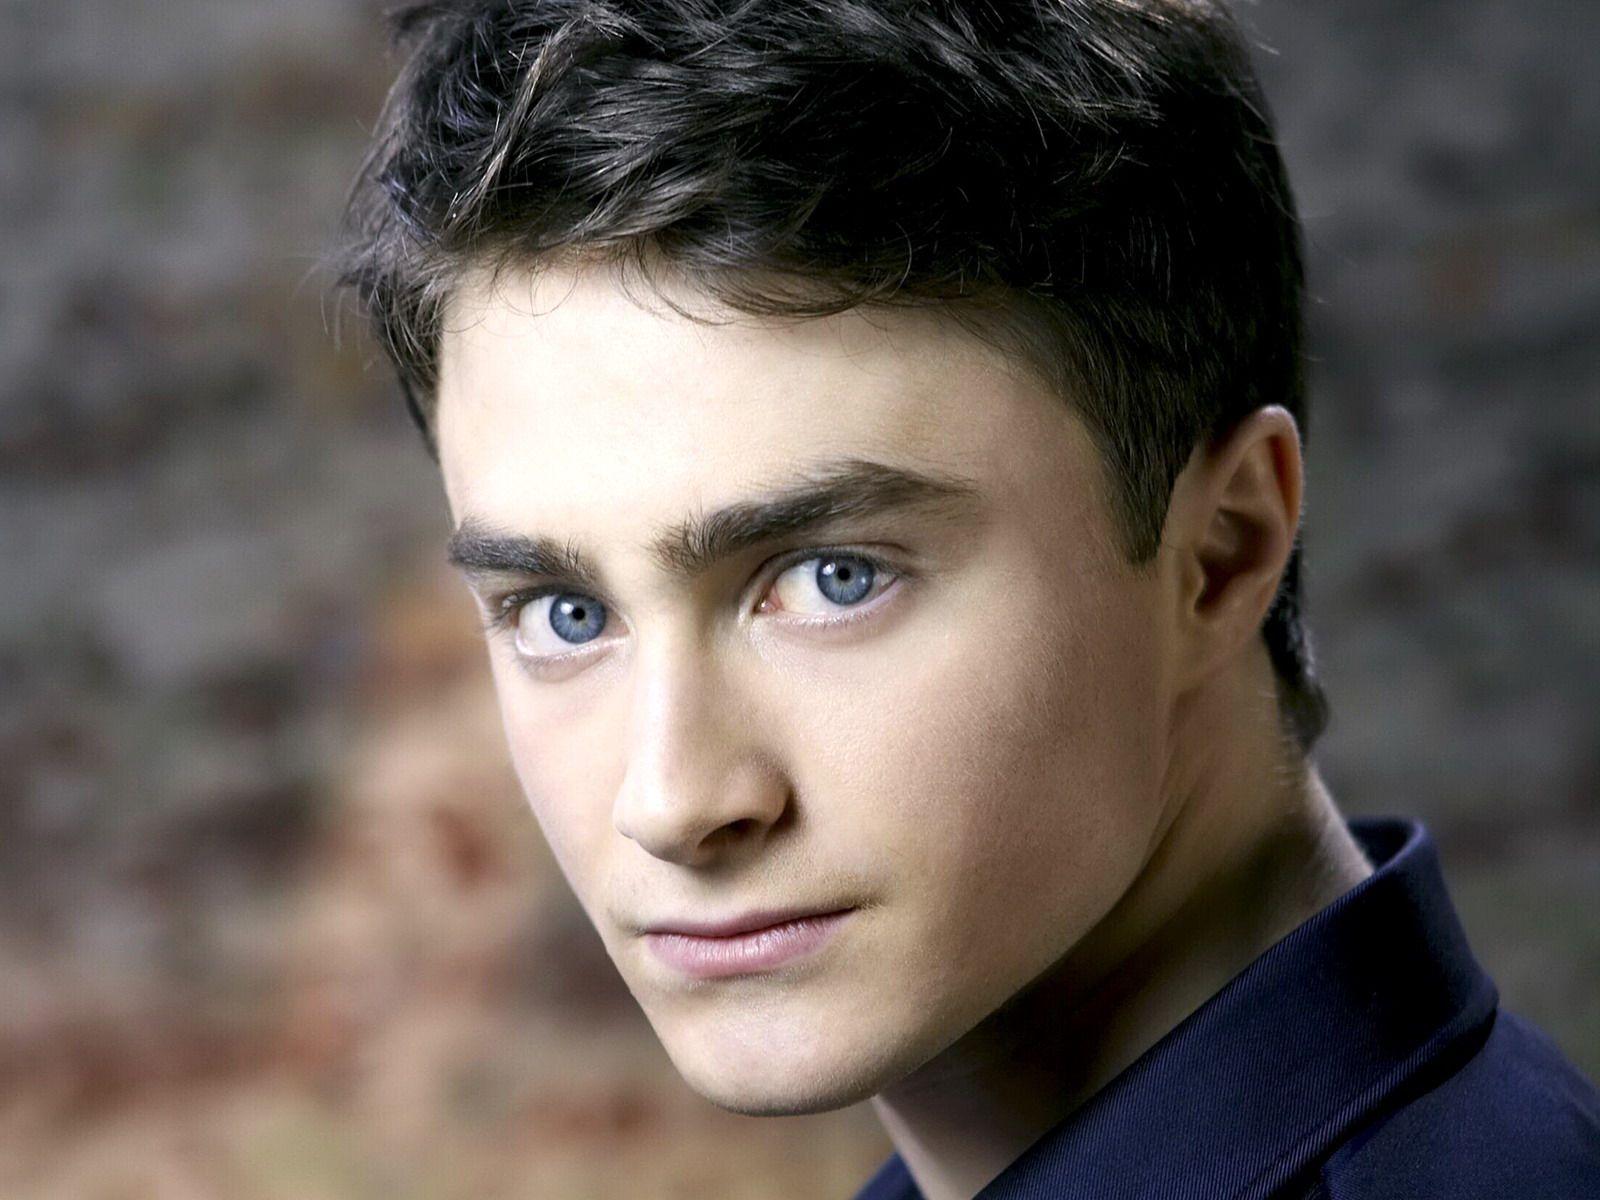 Daniel Radcliffe Daniel Radcliffe Actors Male Celebs Hollywood Black Hair Blue Eyes Hairstyles For Teenage Guys Daniel Radcliffe